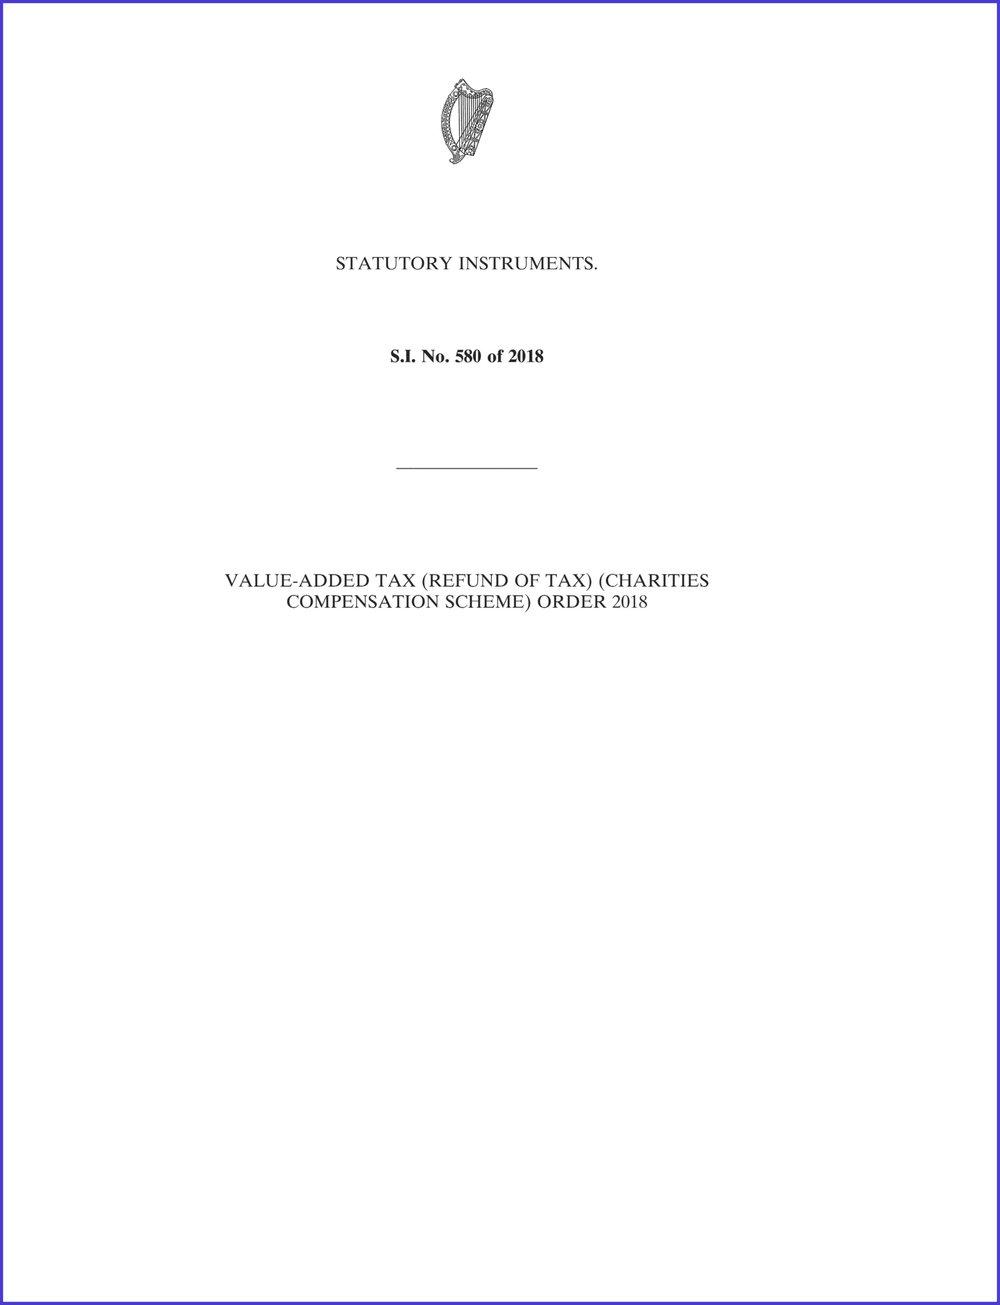 VAT compensation scheme for charities